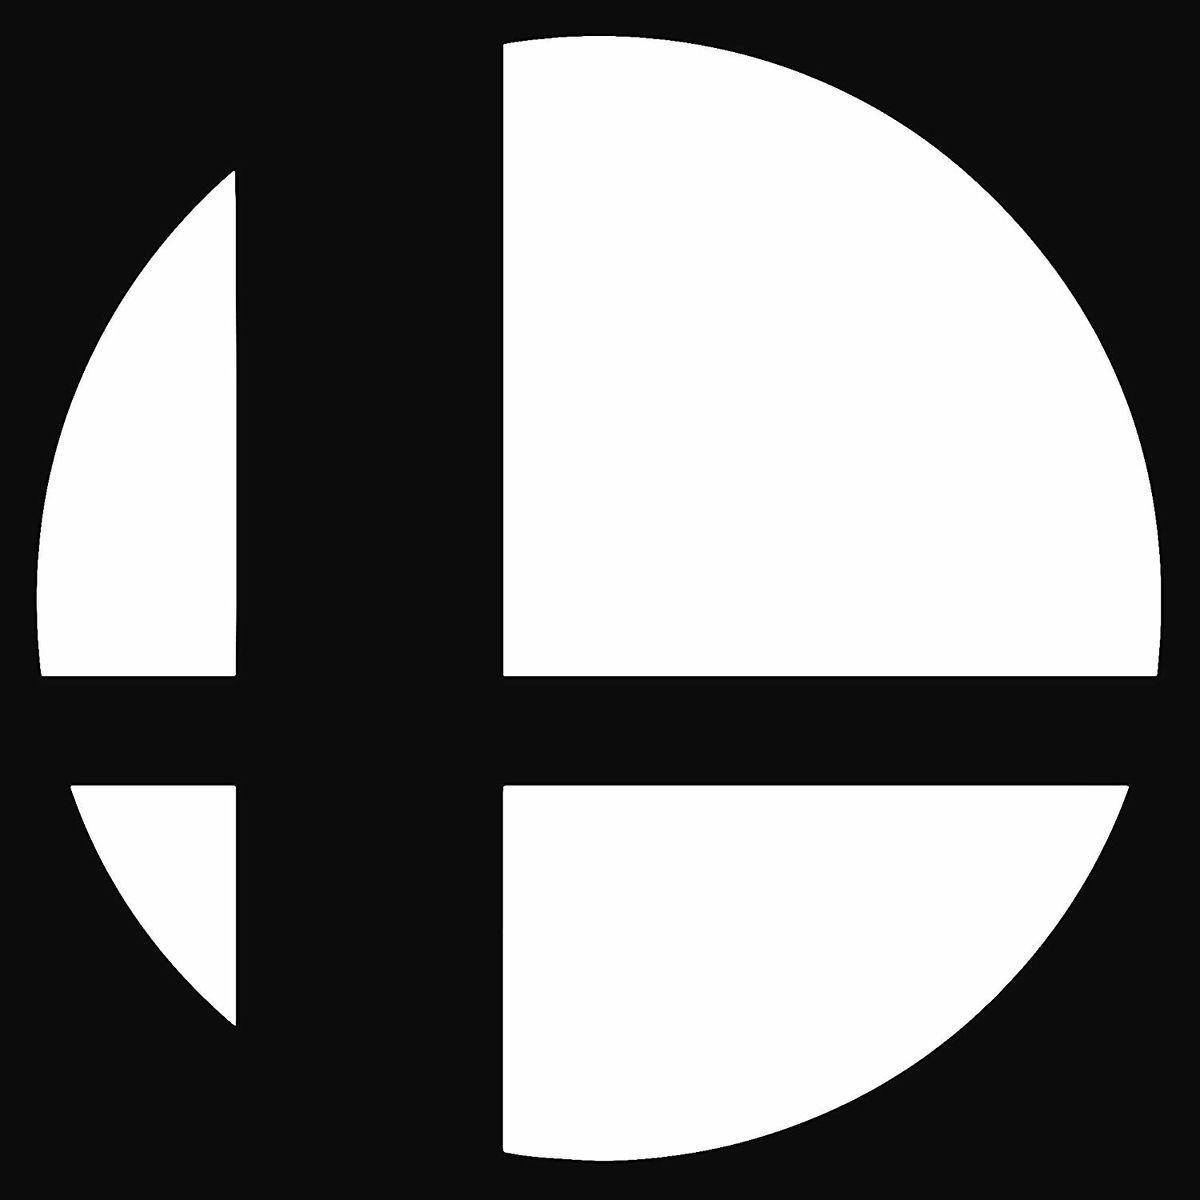 Super Smash Bros. Fandom and Hatedom.